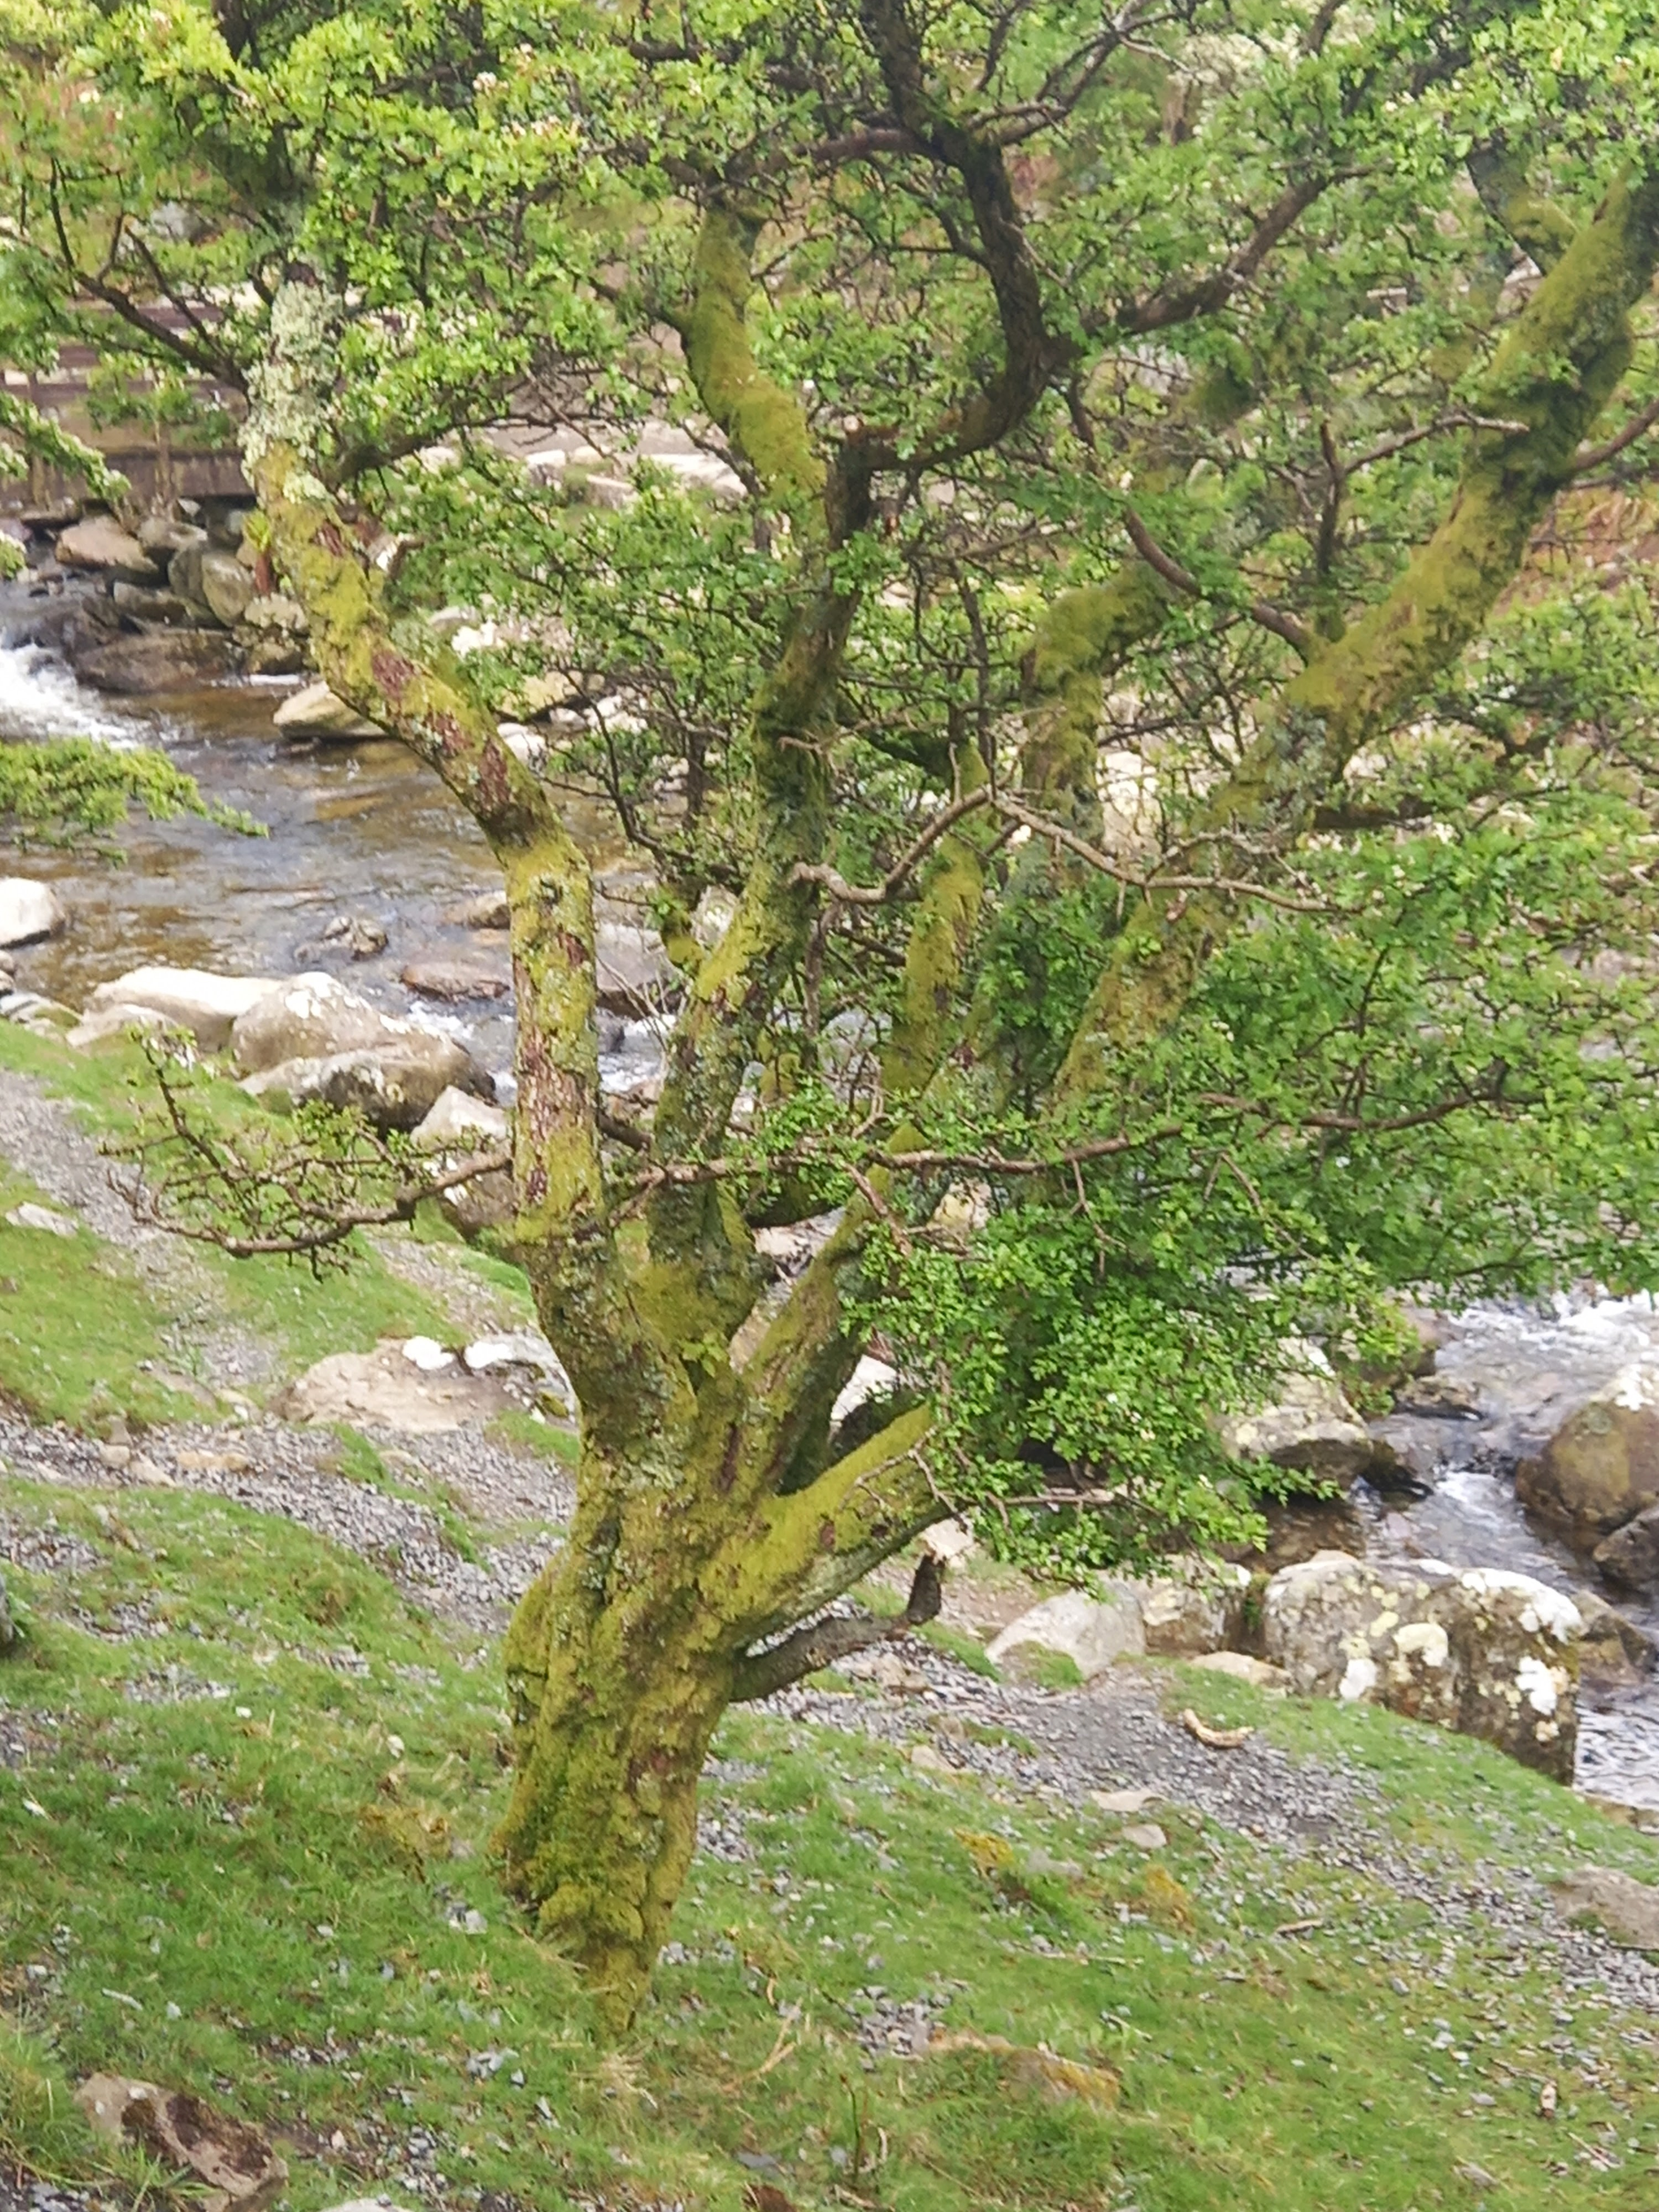 An old oak tree at Aber Falls taken by Diane Woodrow